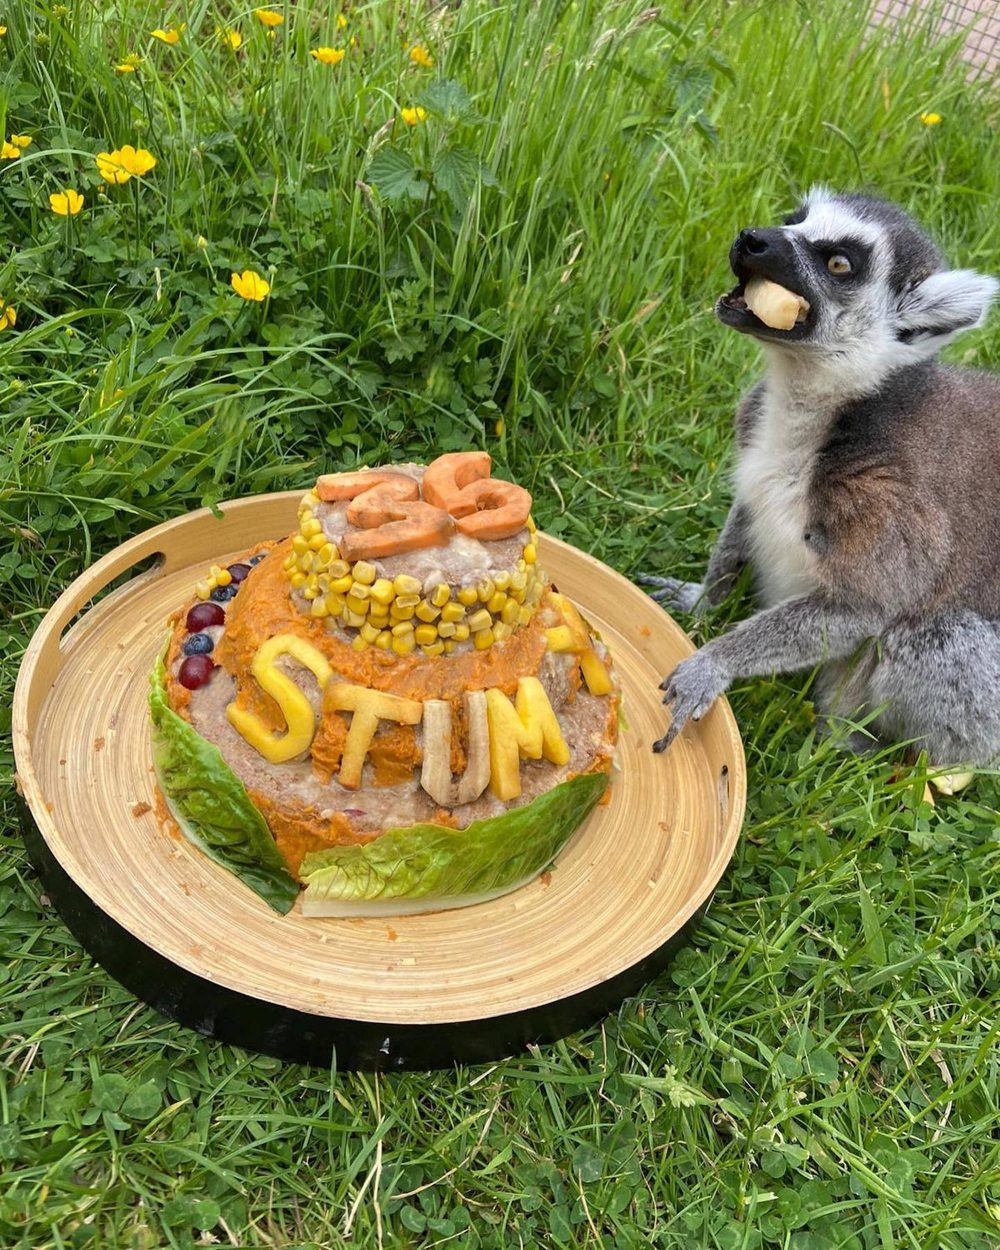 35 year old stumpy with his birthday cake   Animal News Scotland